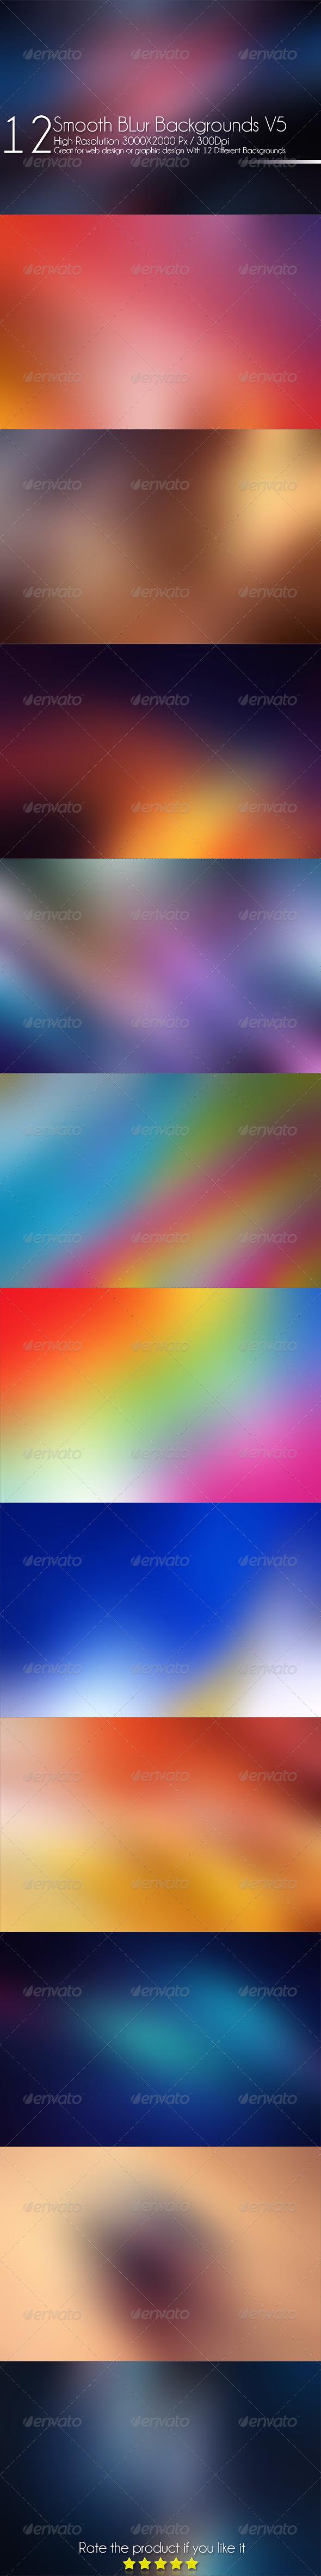 GraphicRiver 12 Smooth Blur Background V5 7640623